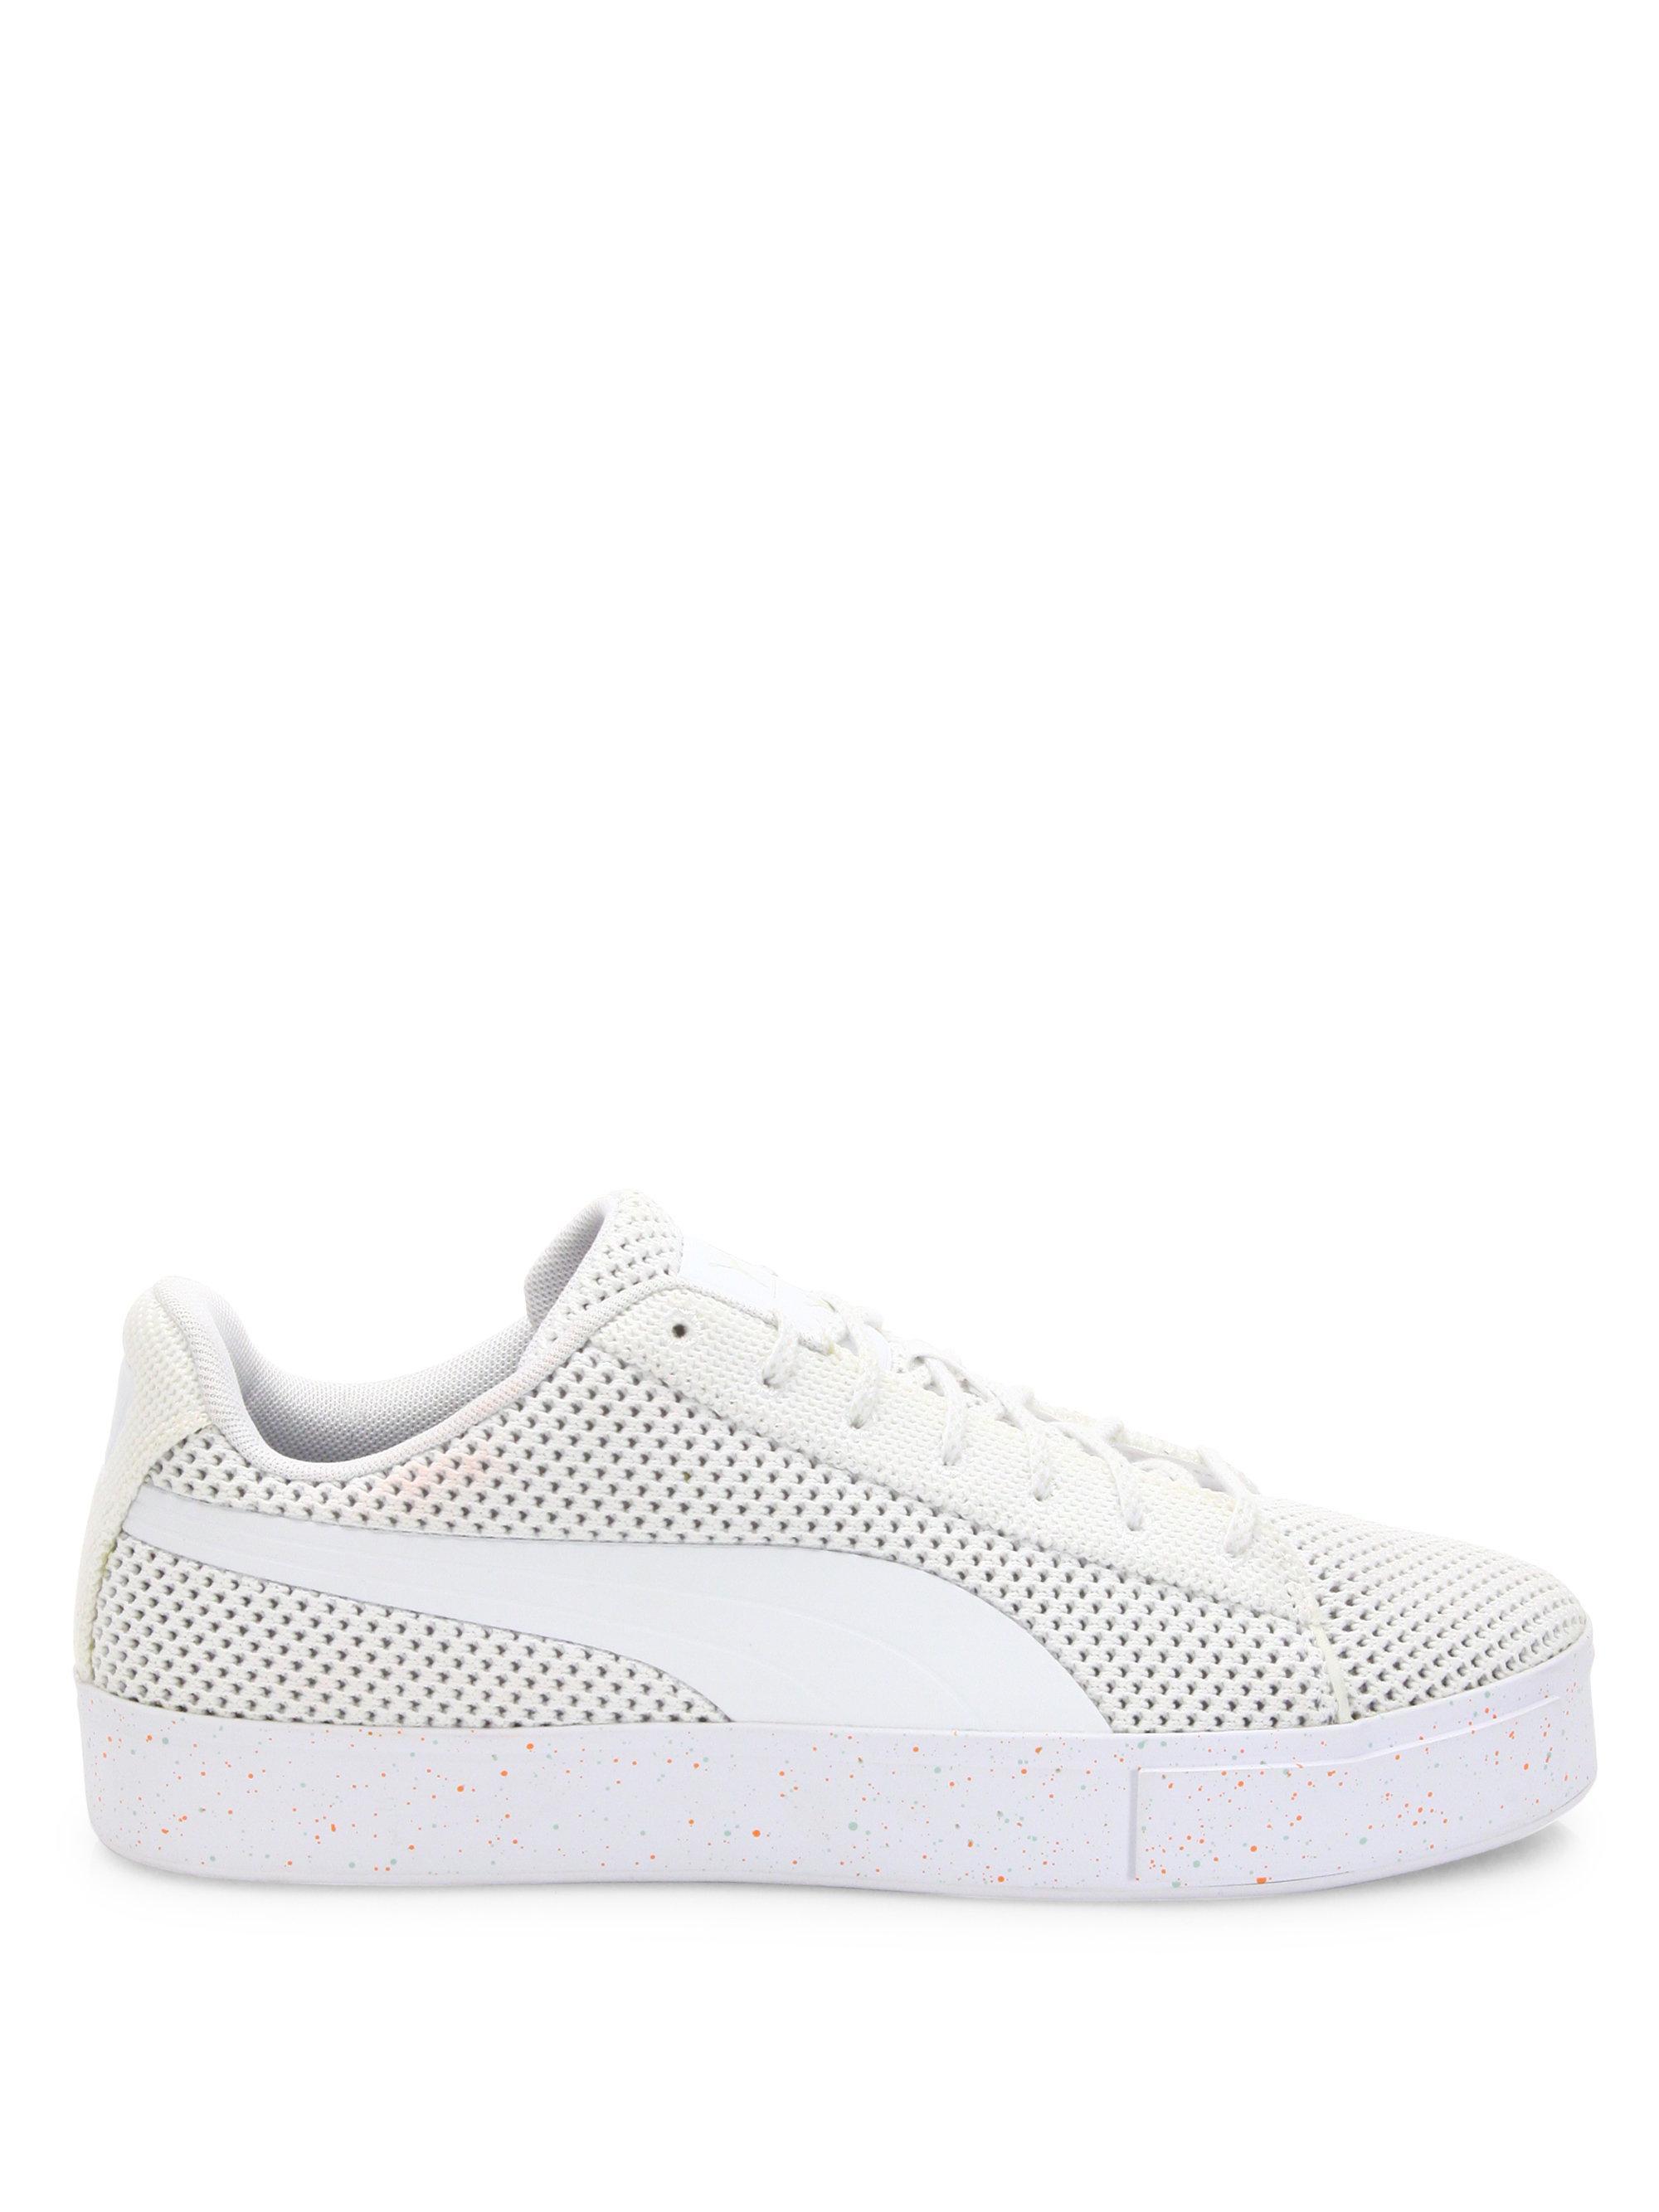 PUMA - White Knitted Platform Sneakers - Lyst. View Fullscreen